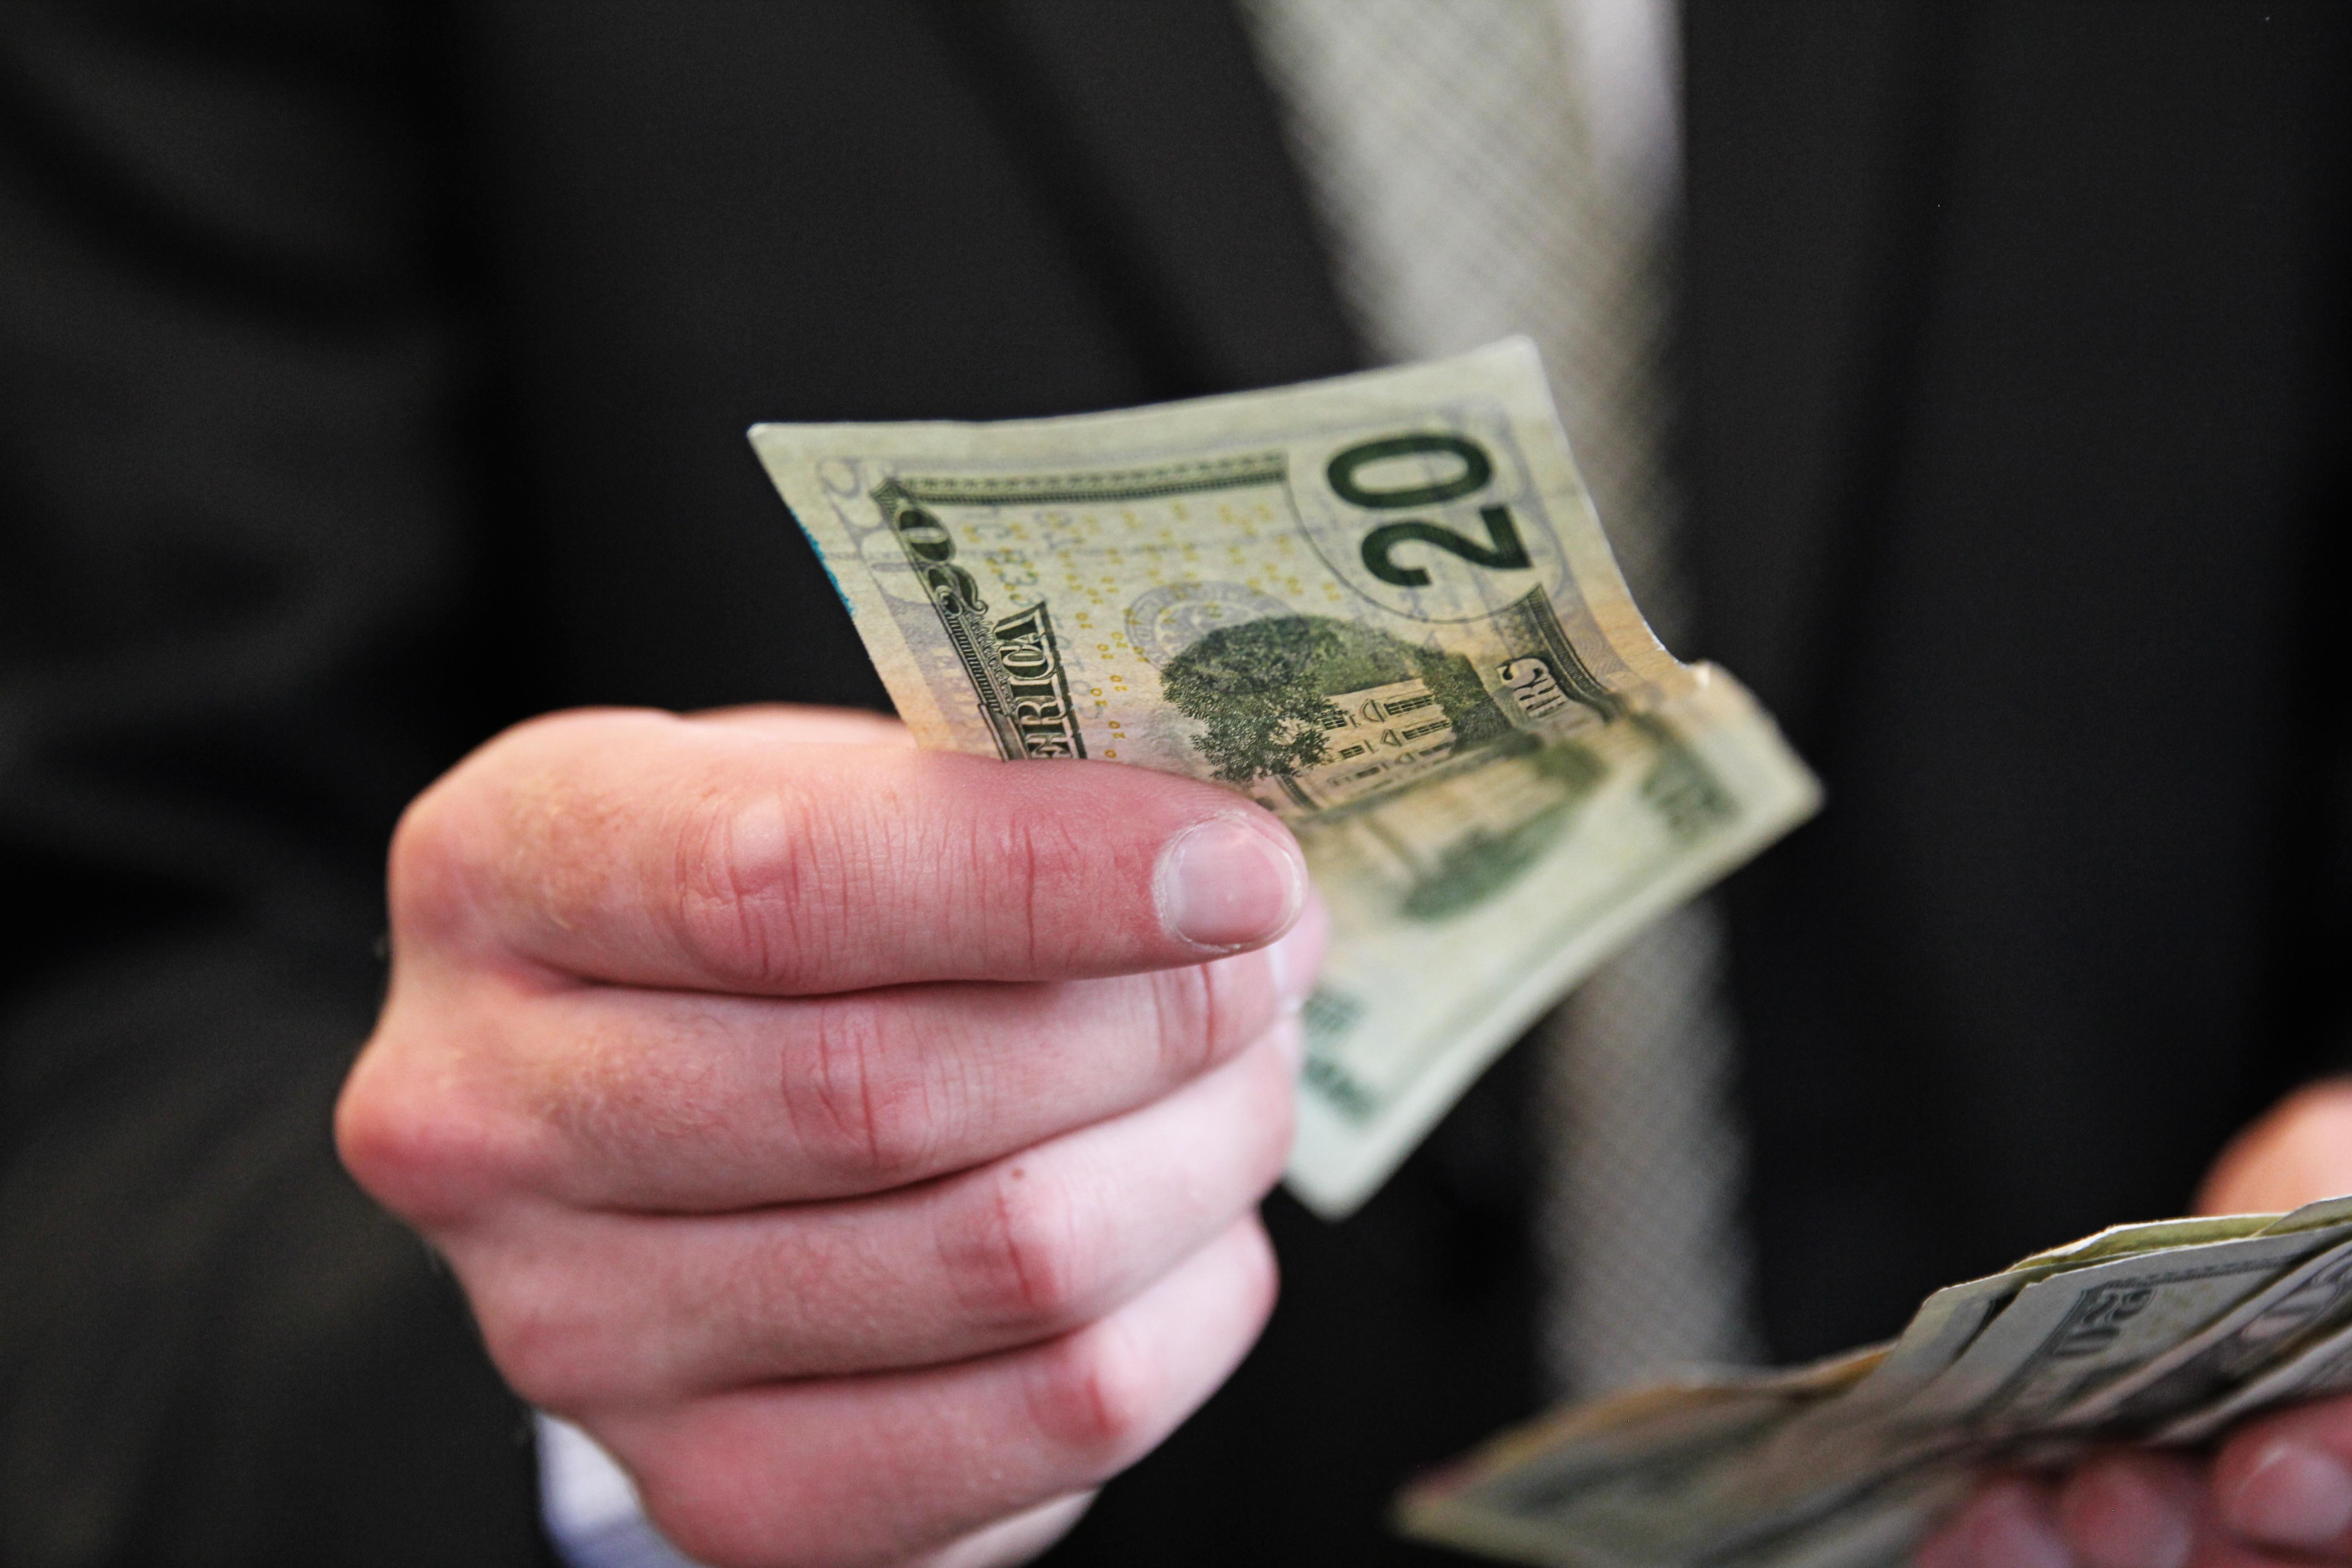 cash | The Frugal Princess